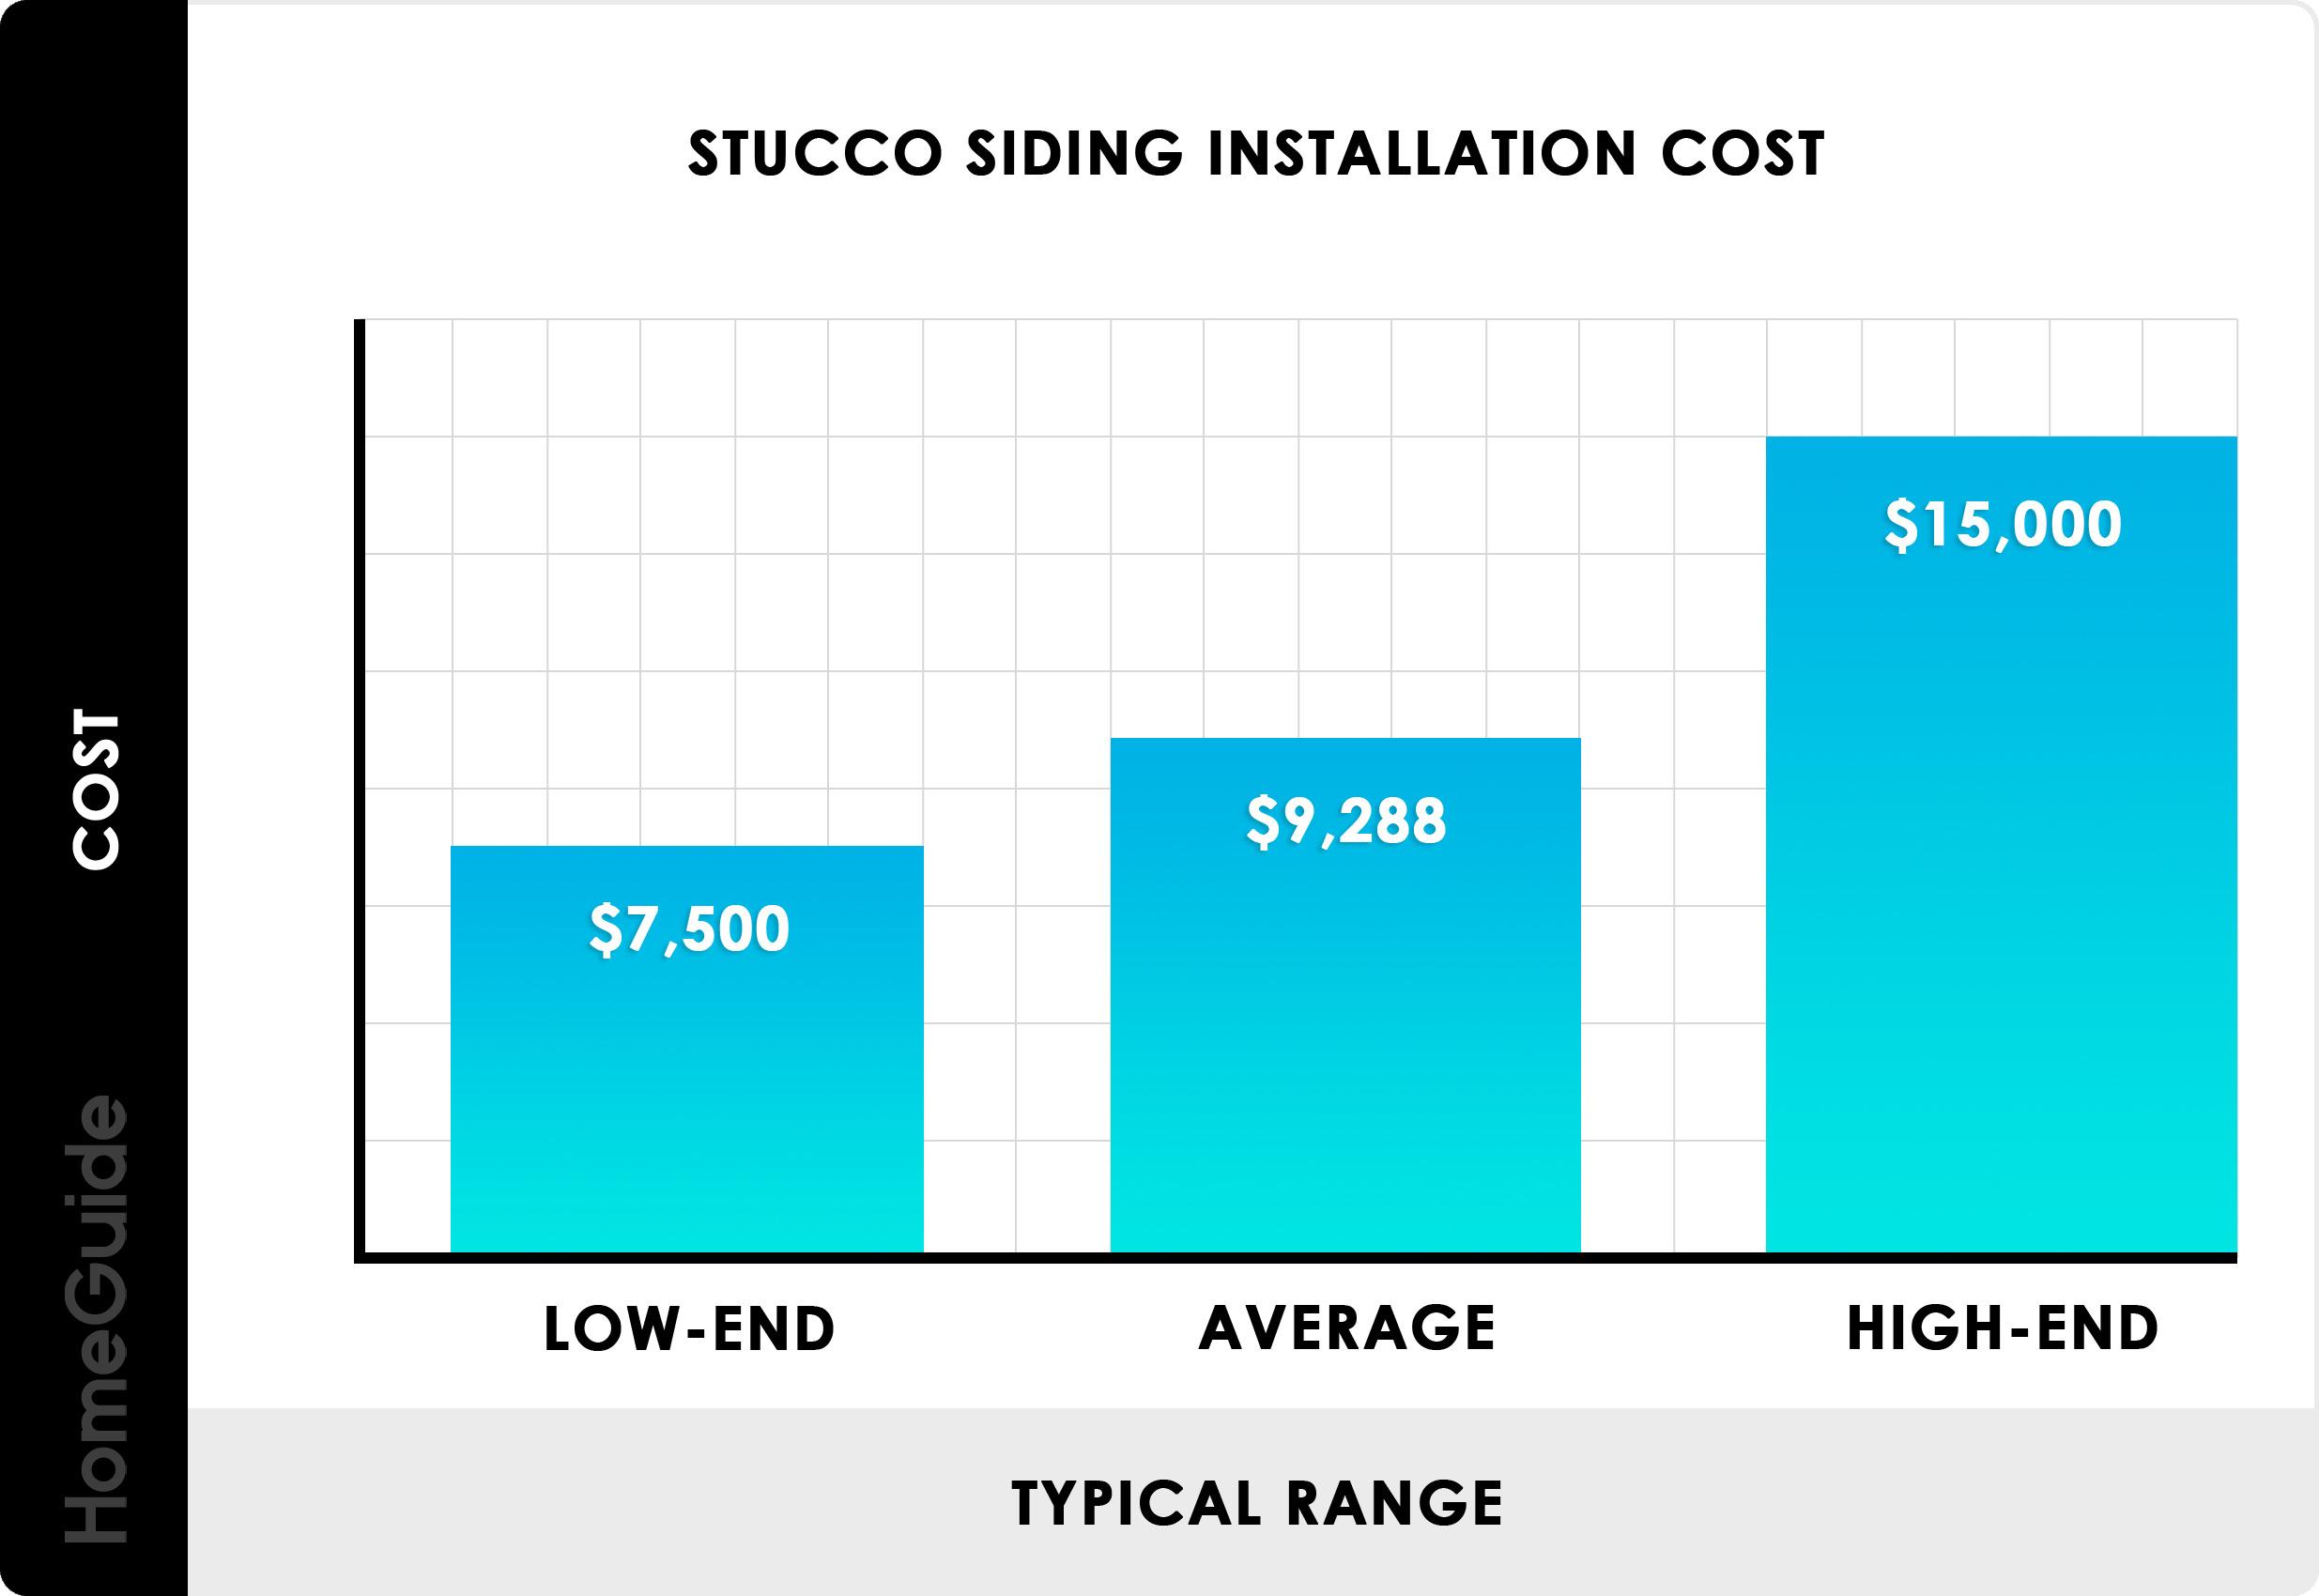 Stucco Siding Prices Per Square Foot